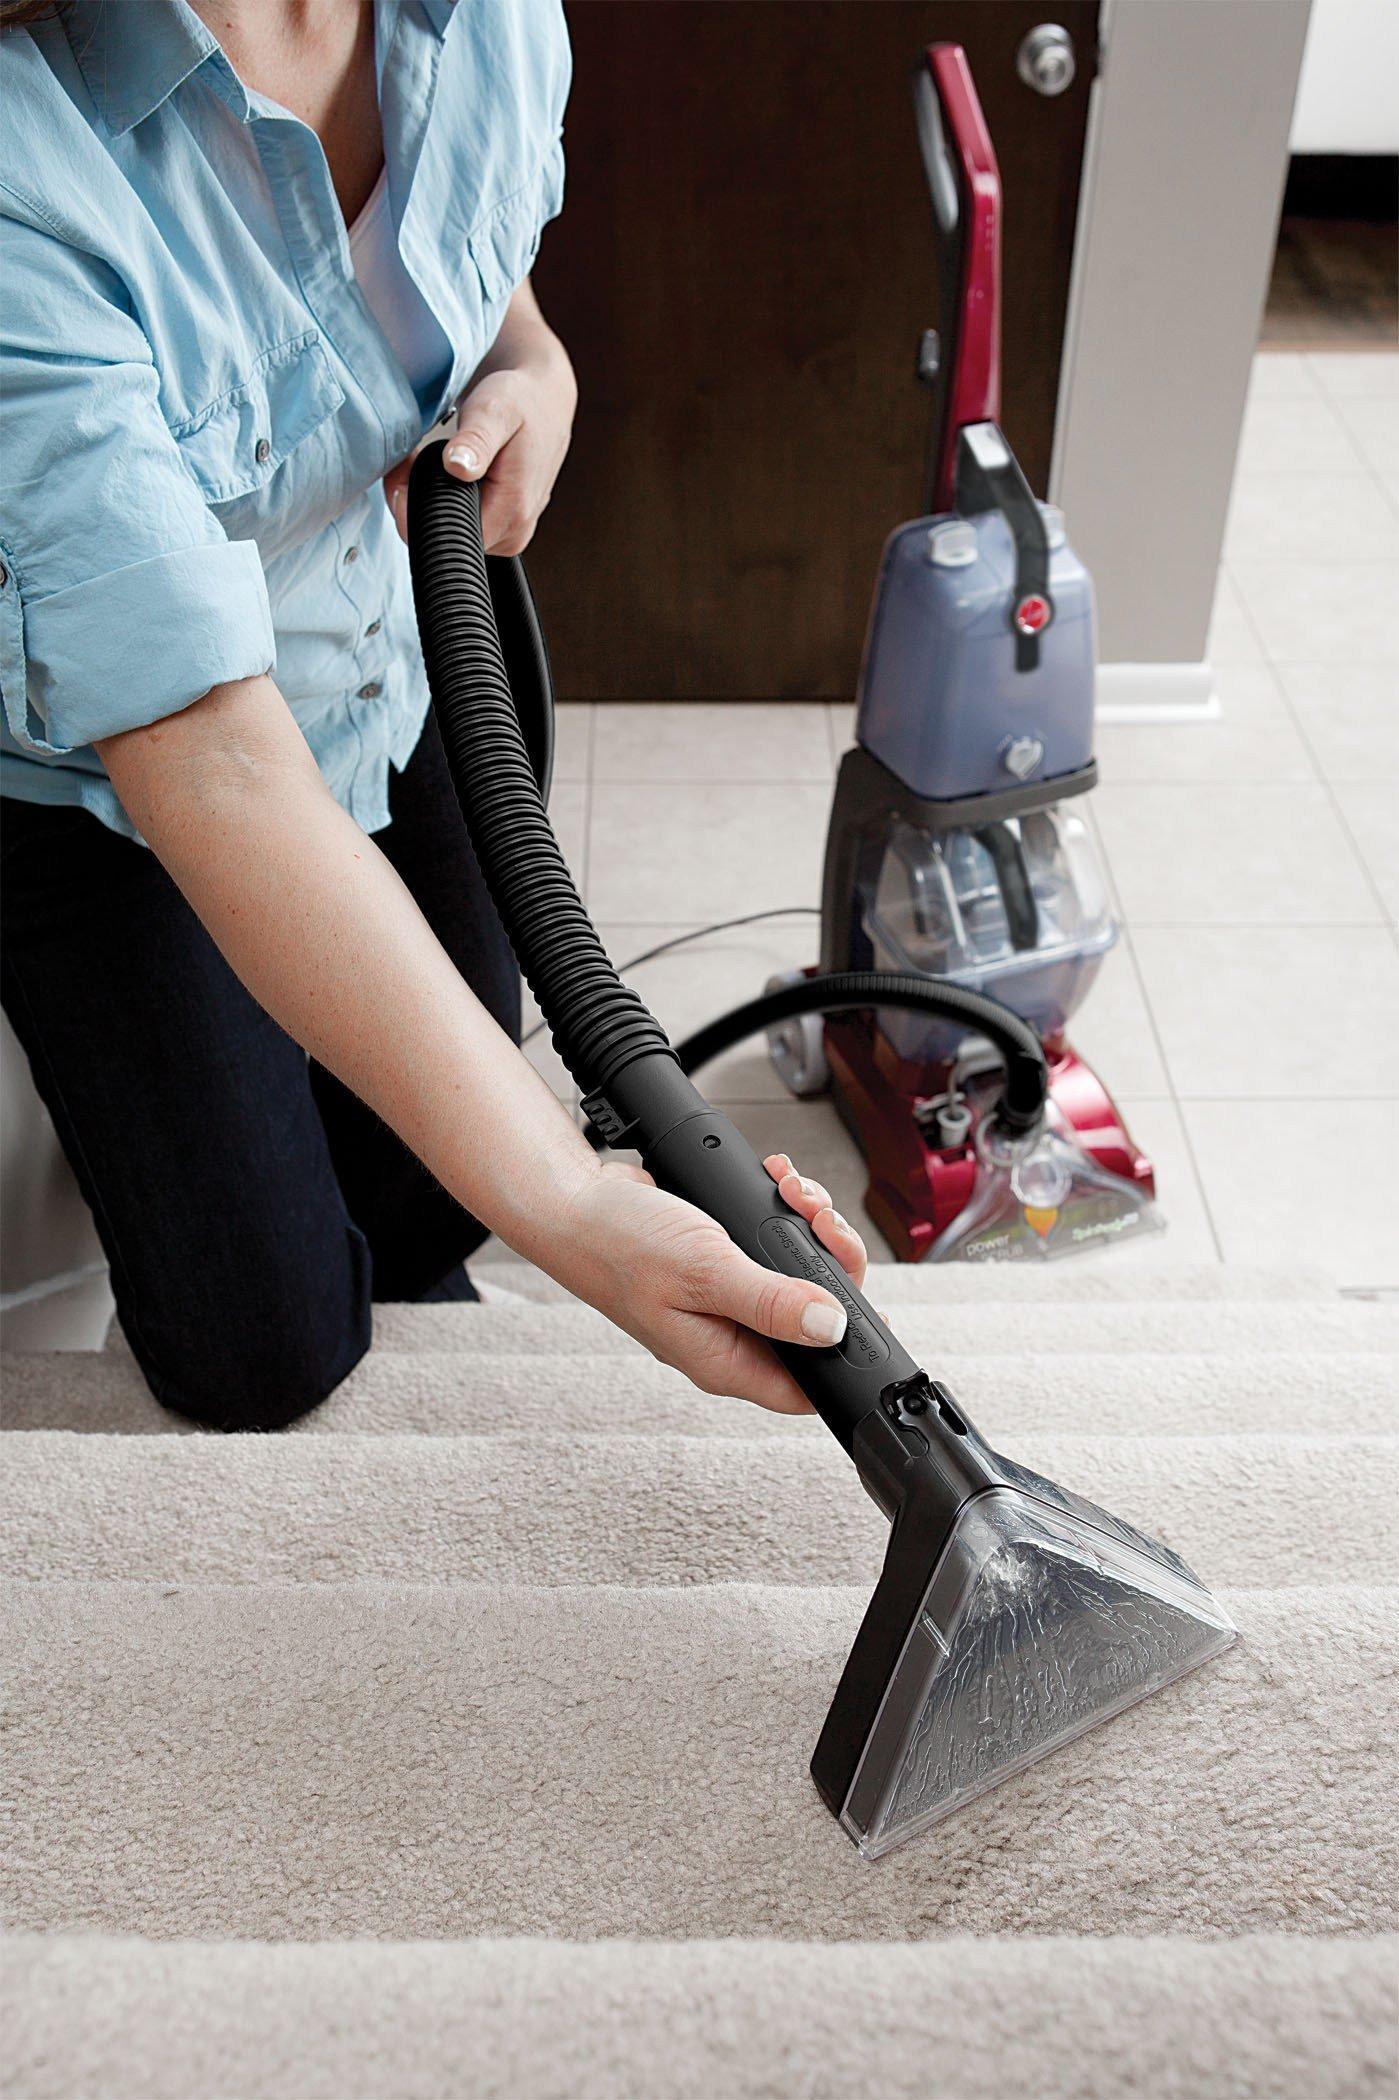 Hoover® Power Scrub Deluxe Carpet Cleaner5